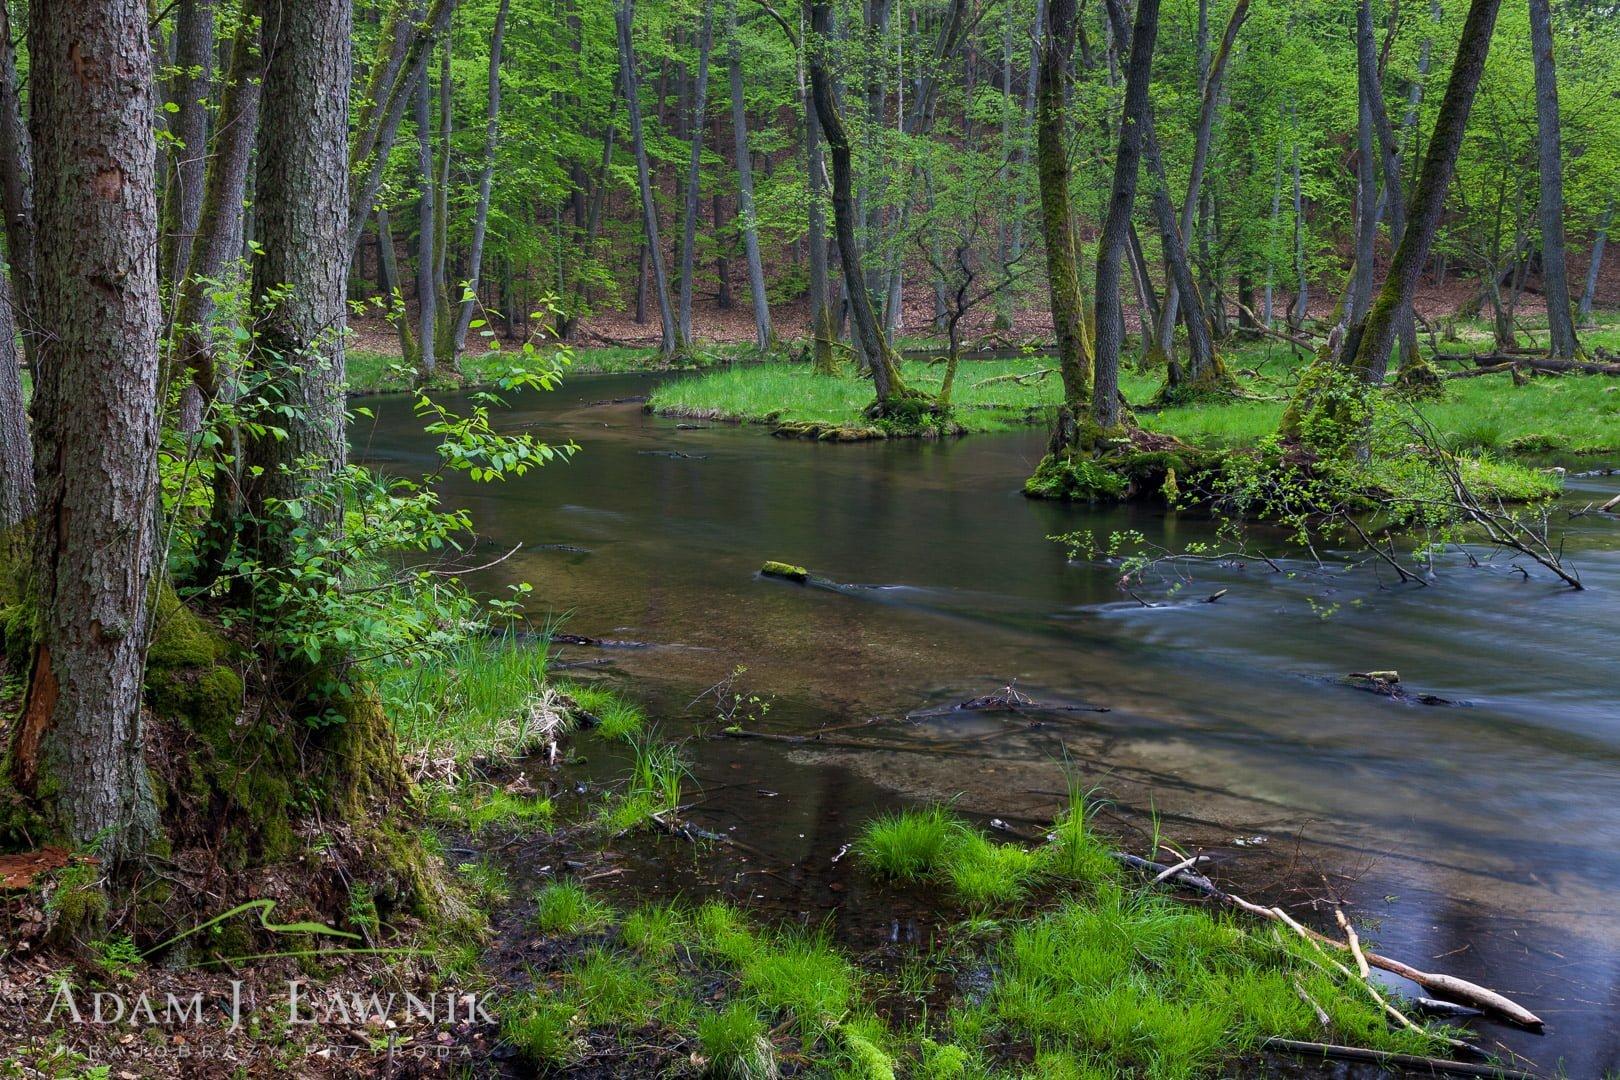 Drawa National Park, Poland 1005-00708C